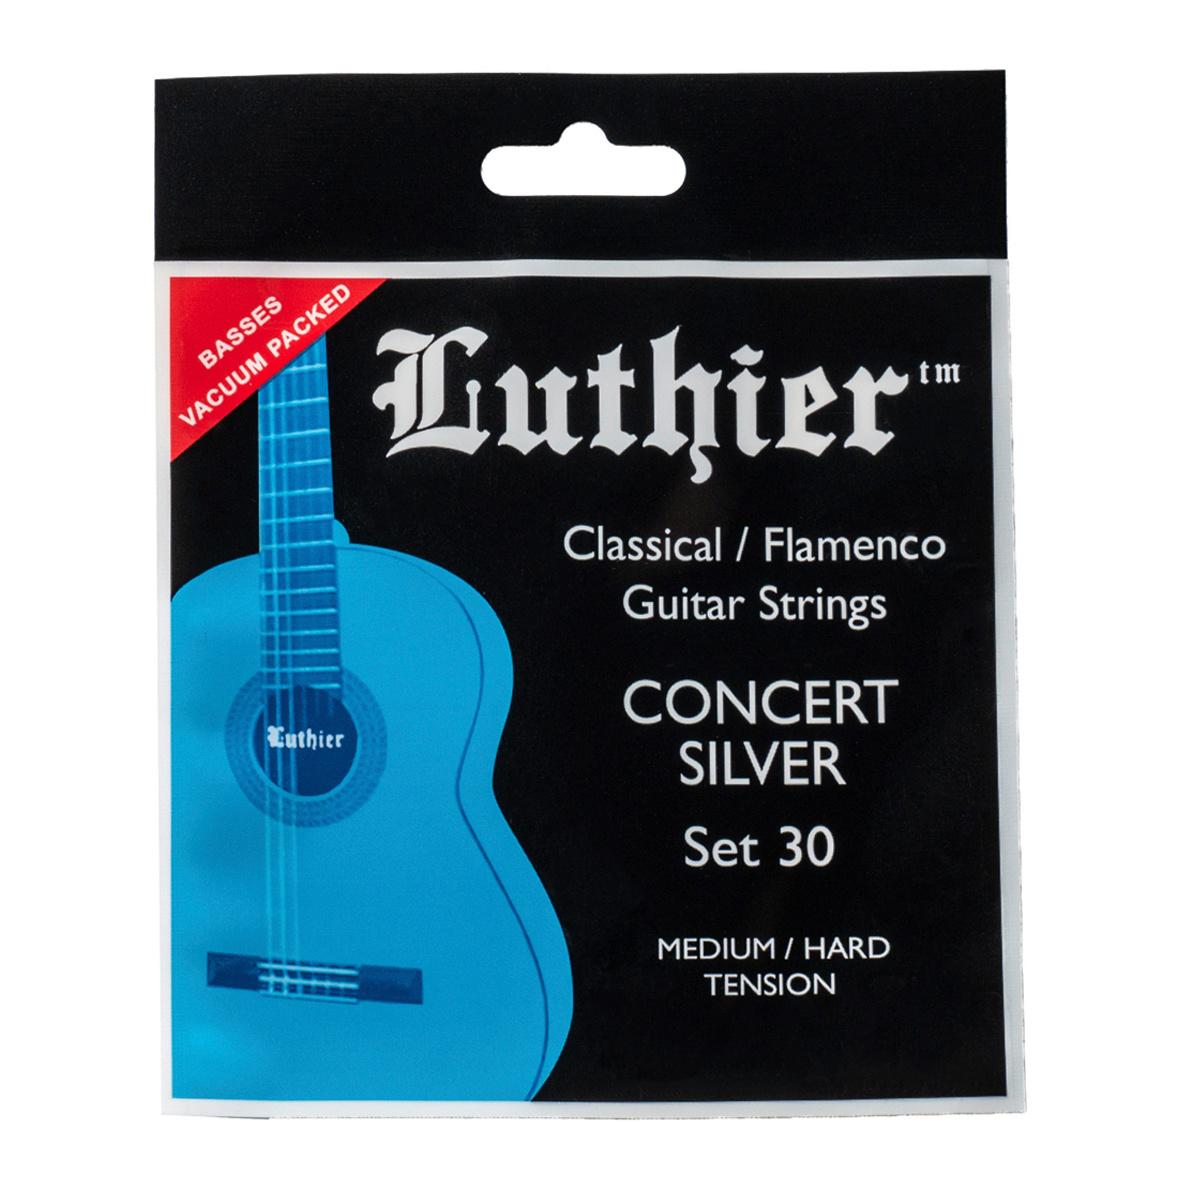 Luthier Luthier Set 30 M/HT Classical/Flamenco Saitensatz